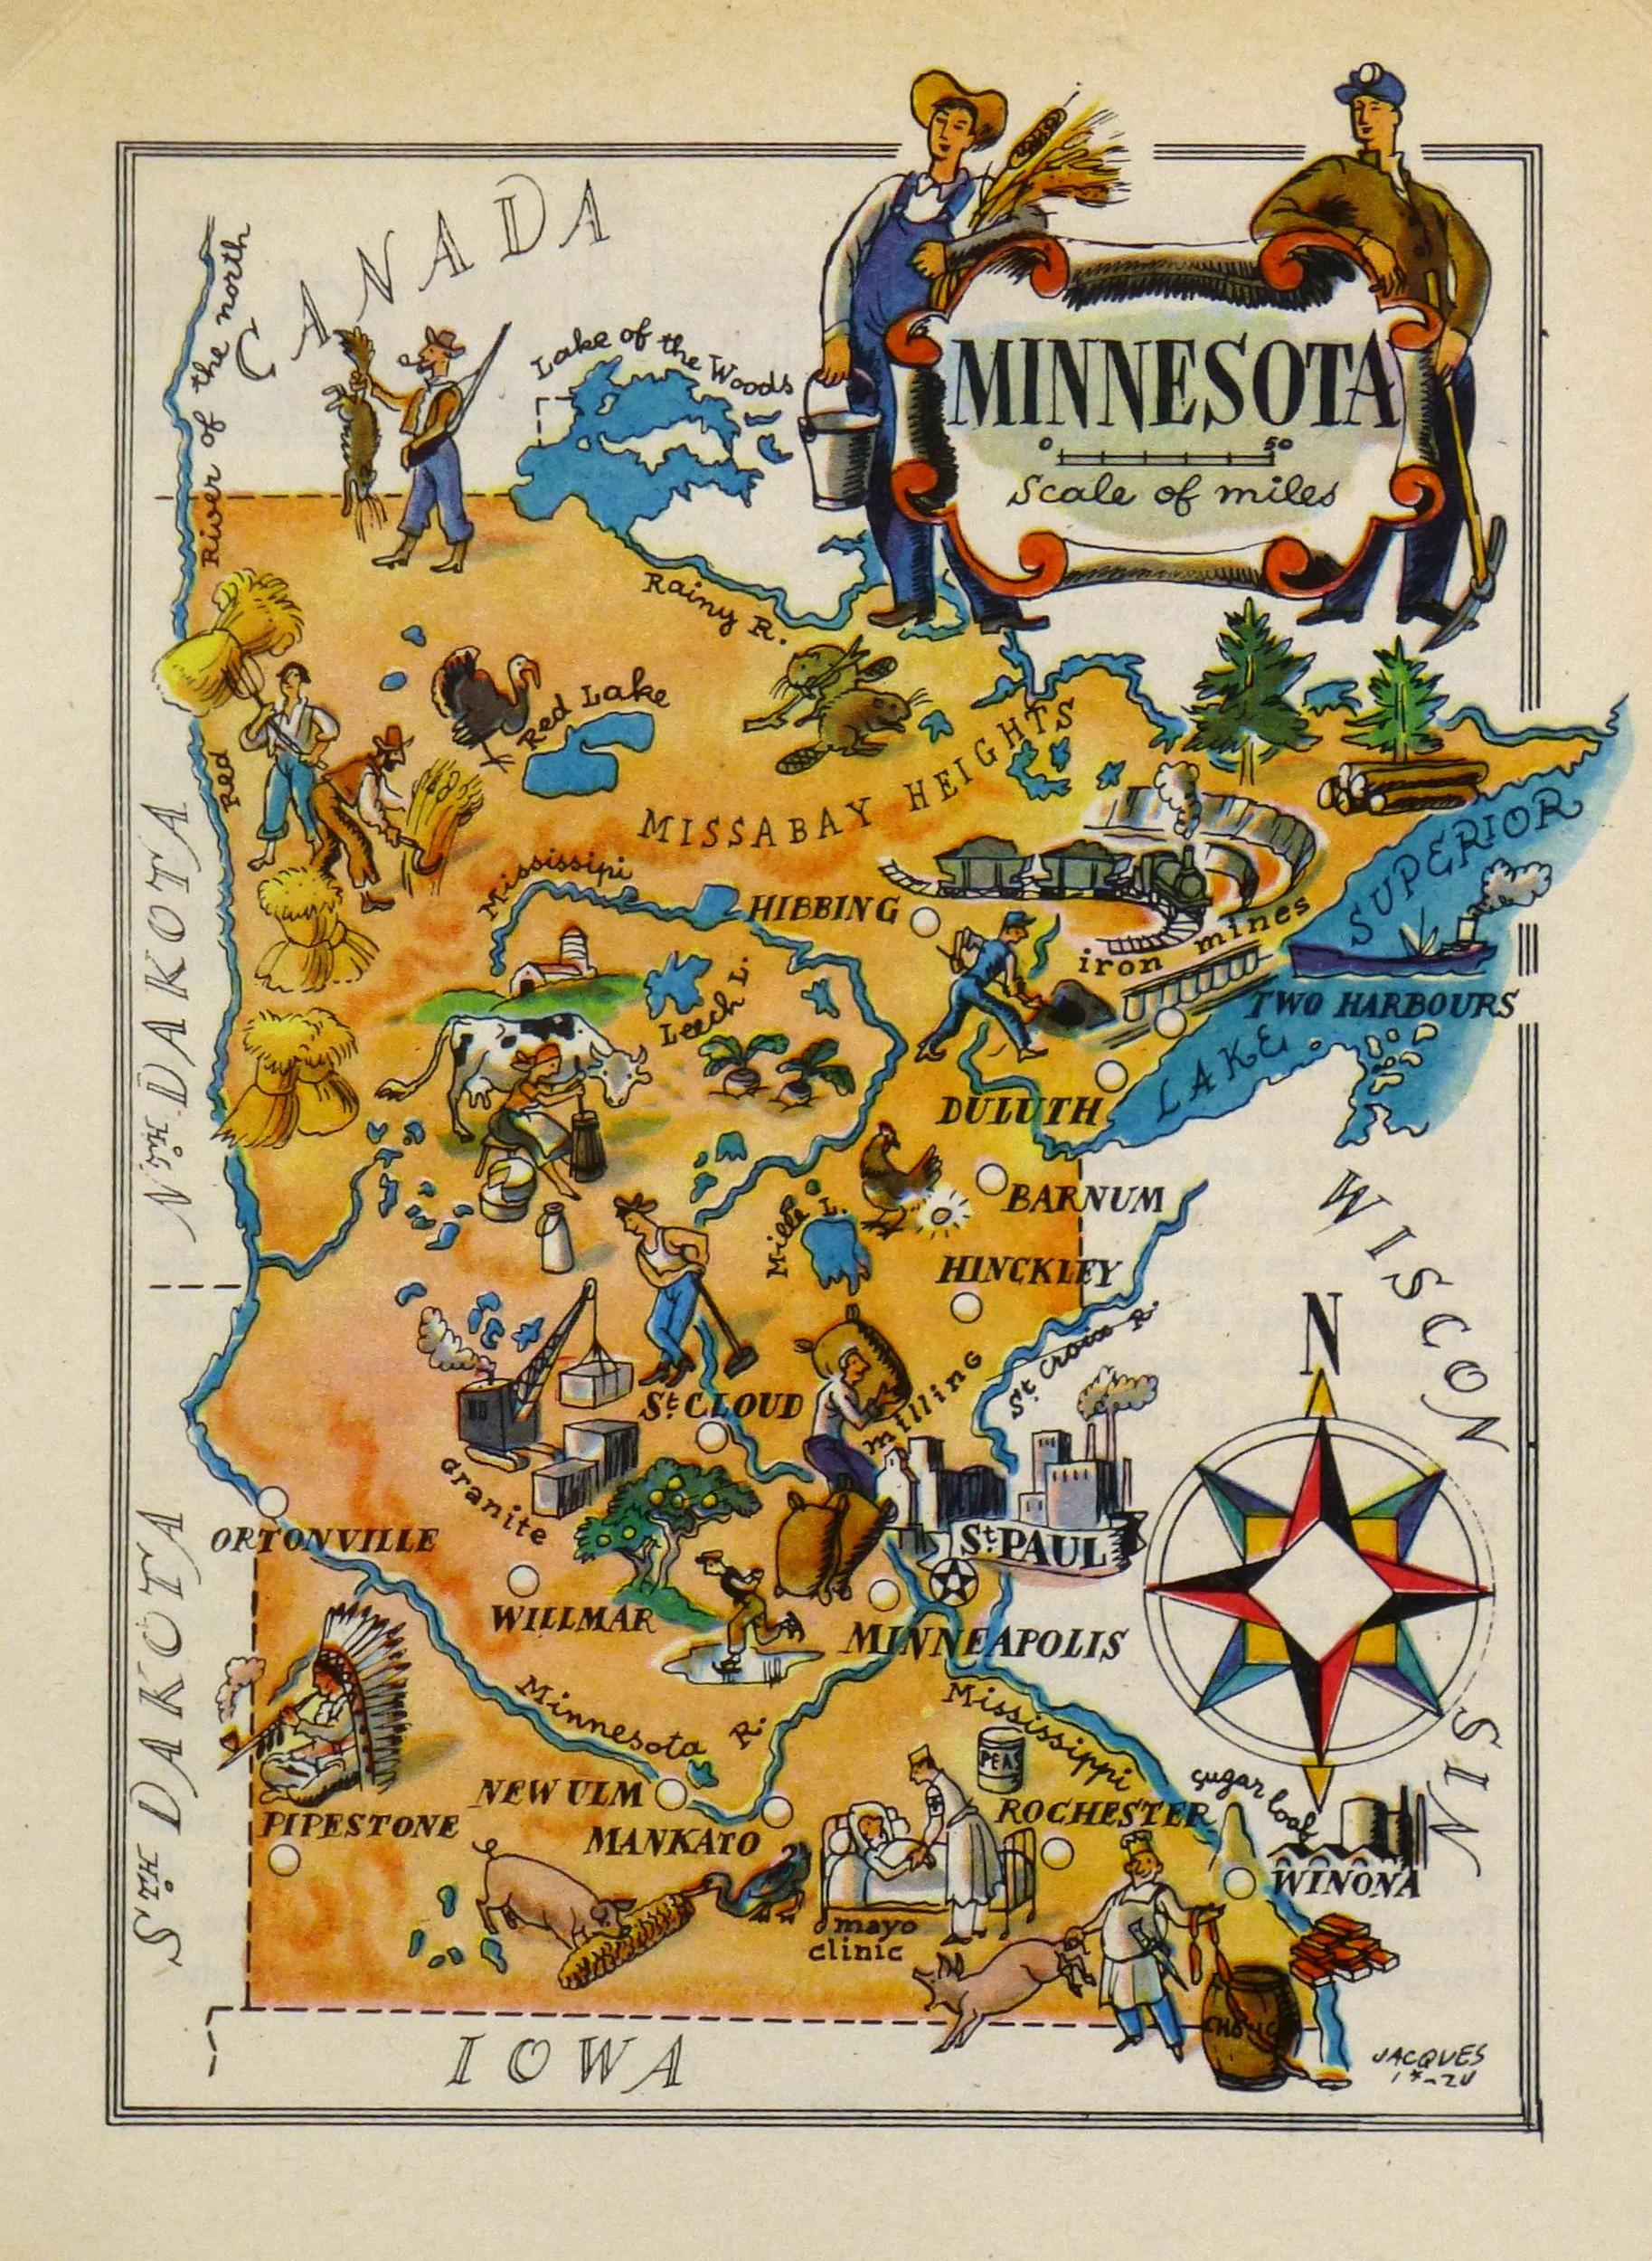 Minnesota Pictorial Map, 1946-main-6230K